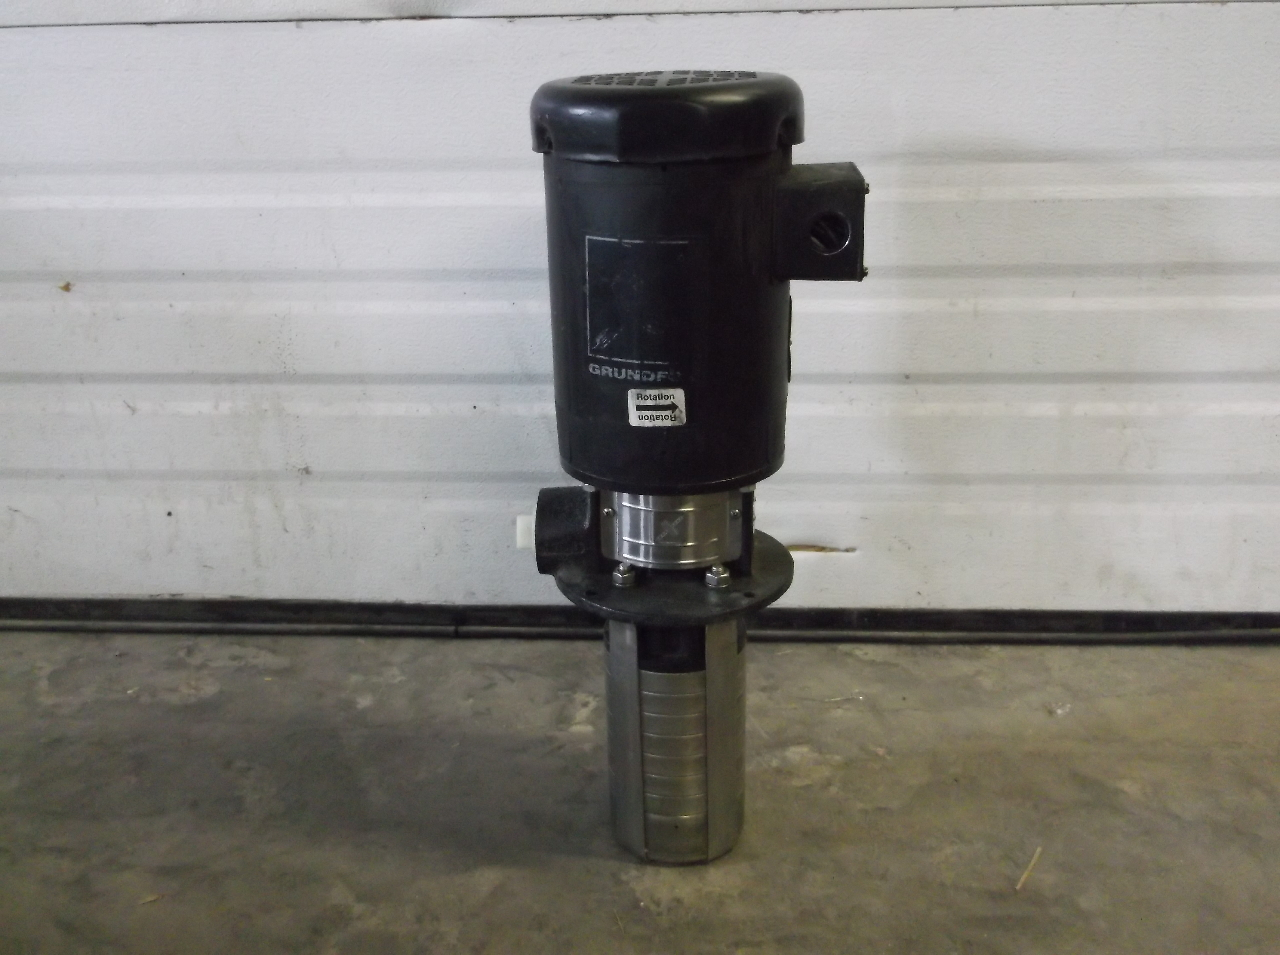 Grundfos crk2 60 verticle high presure pump baldor 1 5 hp for Baldor 1 5 hp motor